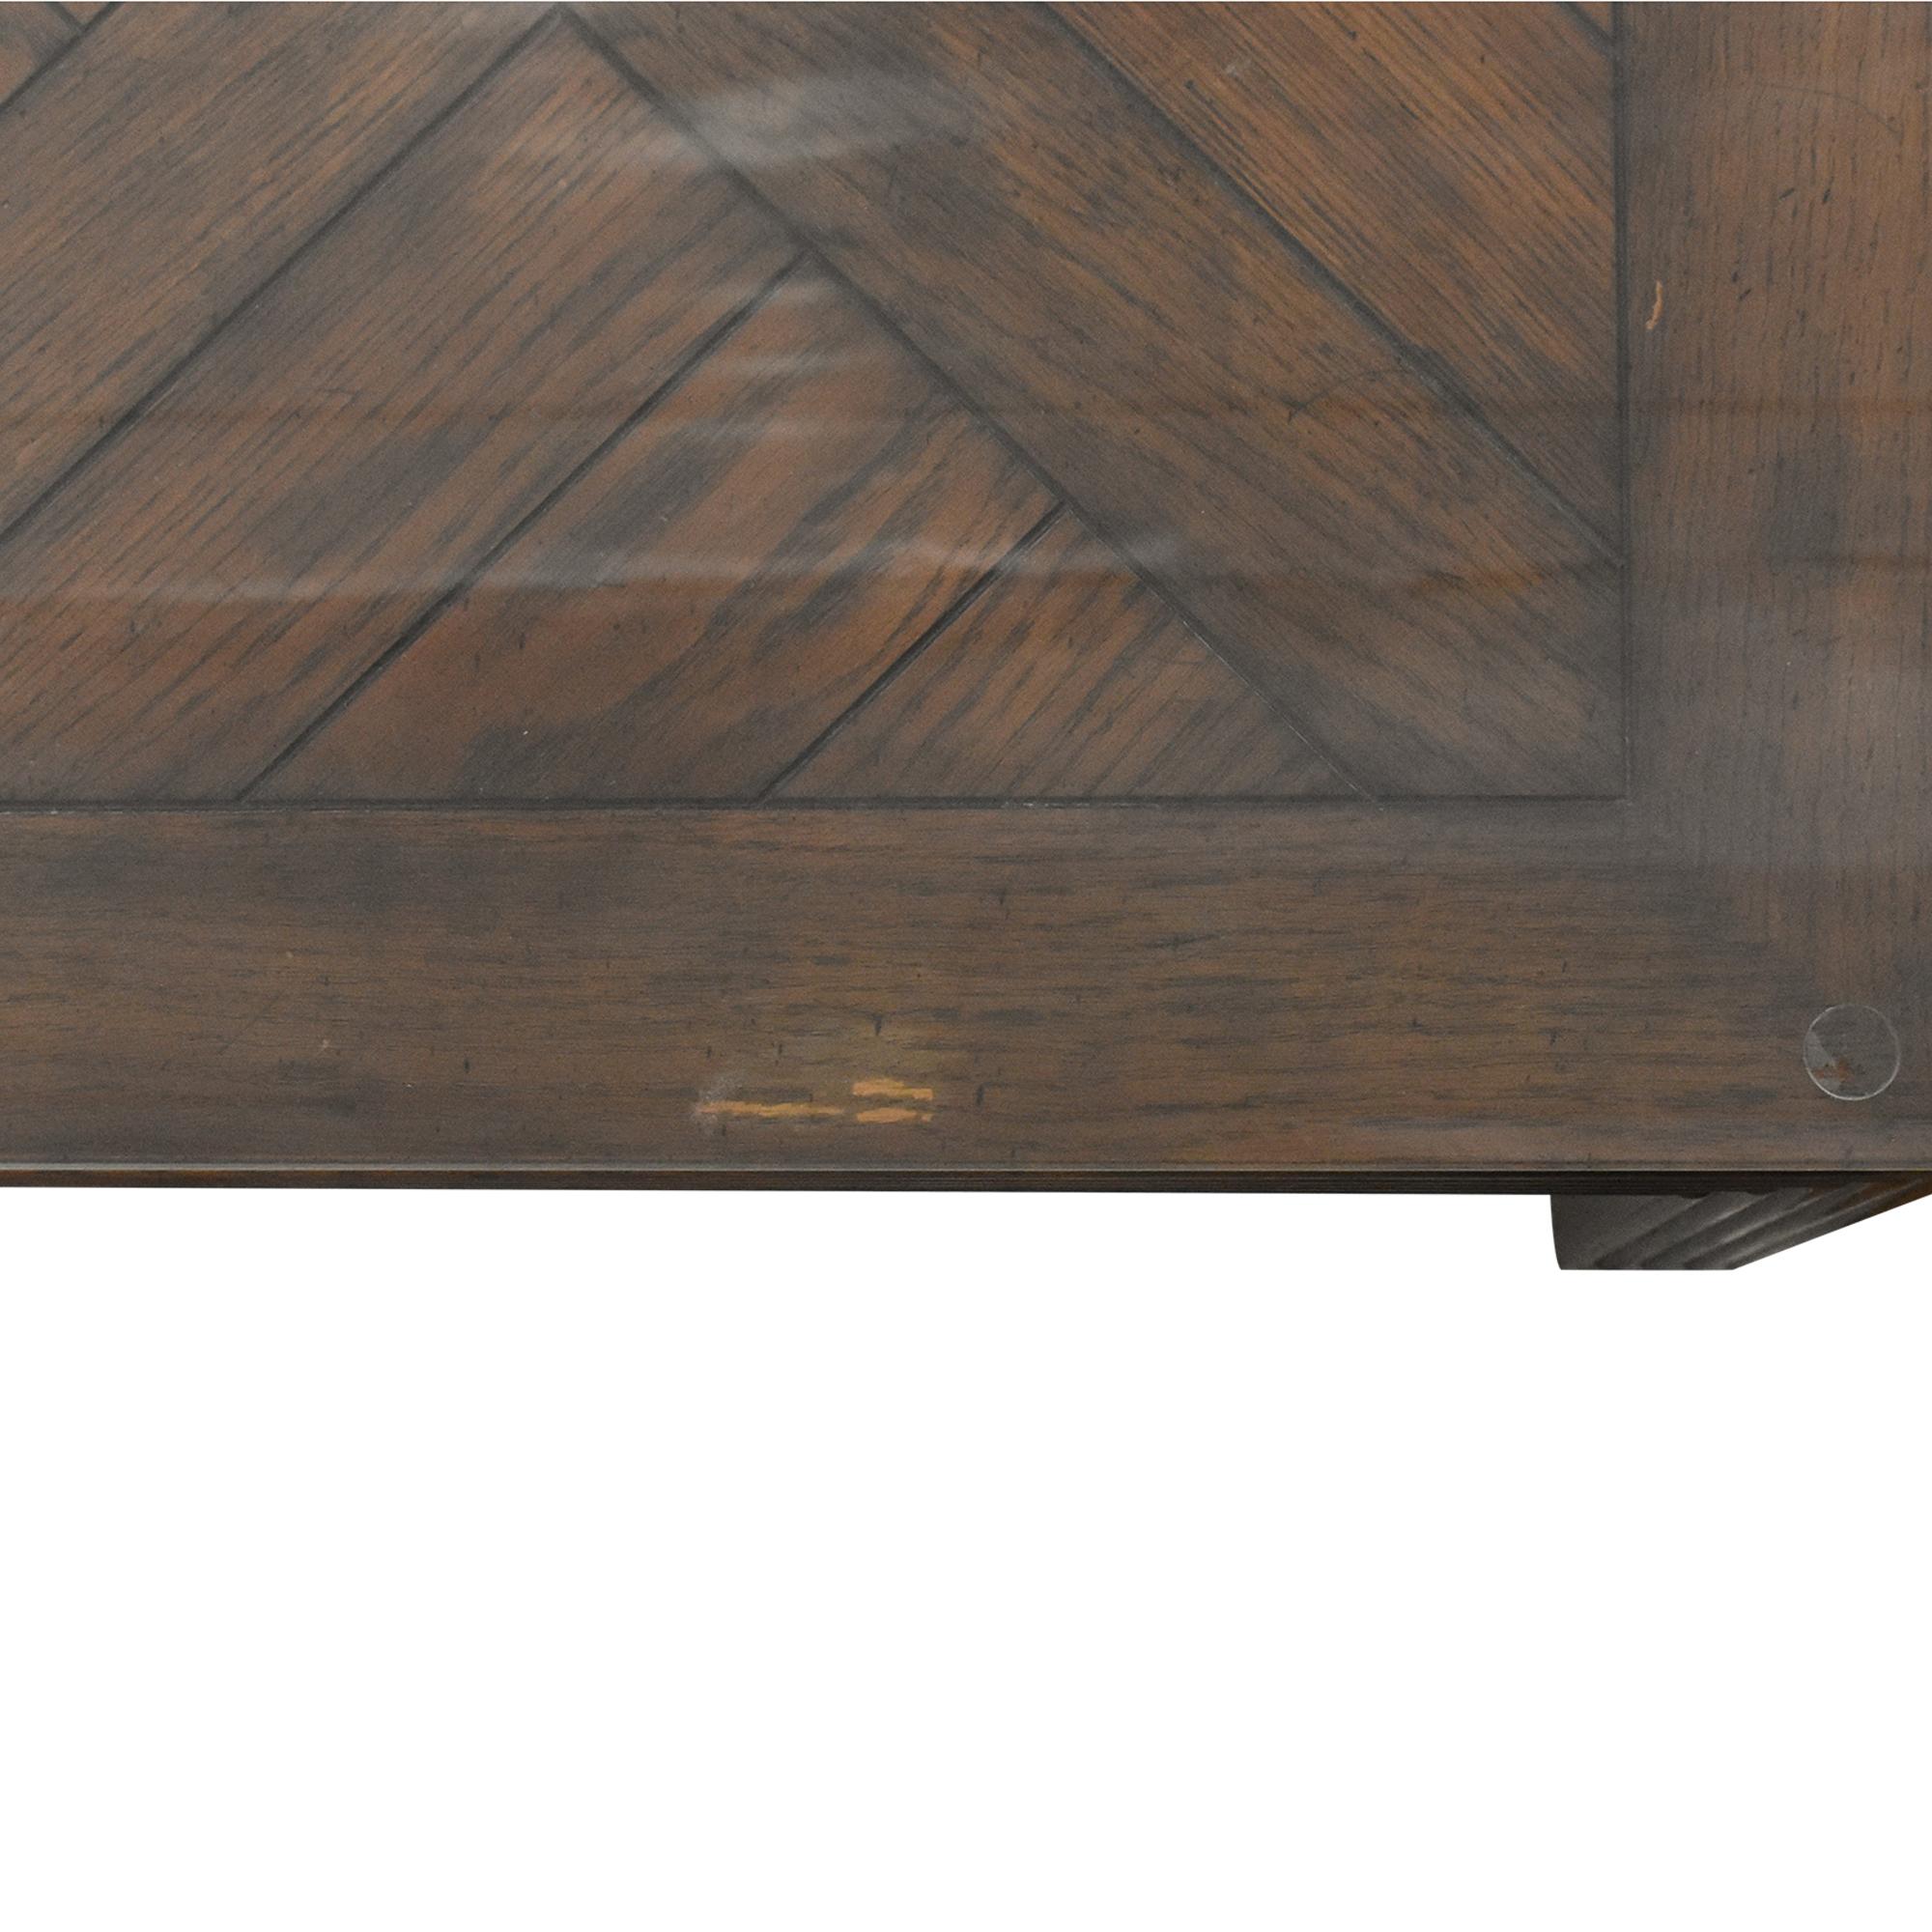 Henredon Furniture Henredon Furniture Square Coffee Table for sale